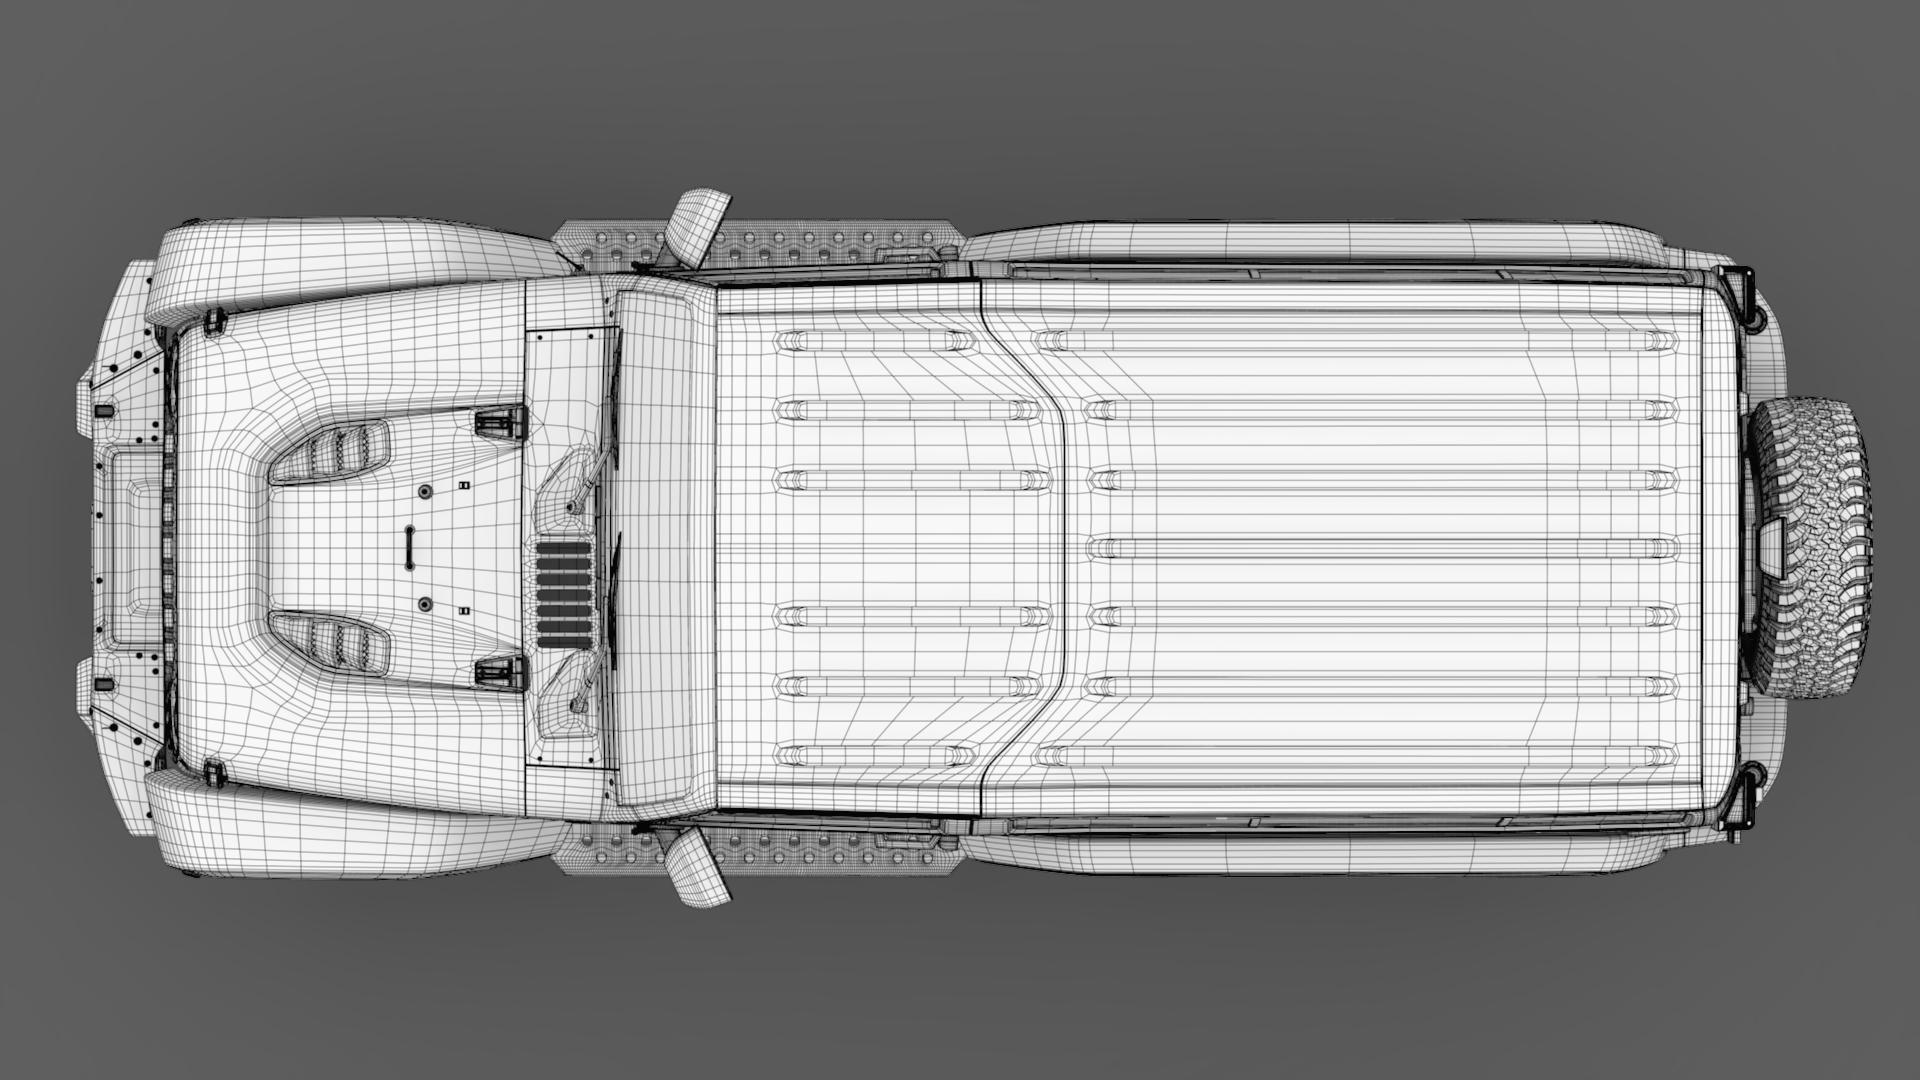 jeep wrangler 6×6 rubicon recon jk 2017 3d model max fbx c4d lwo ma mb hrc xsi obj 276856